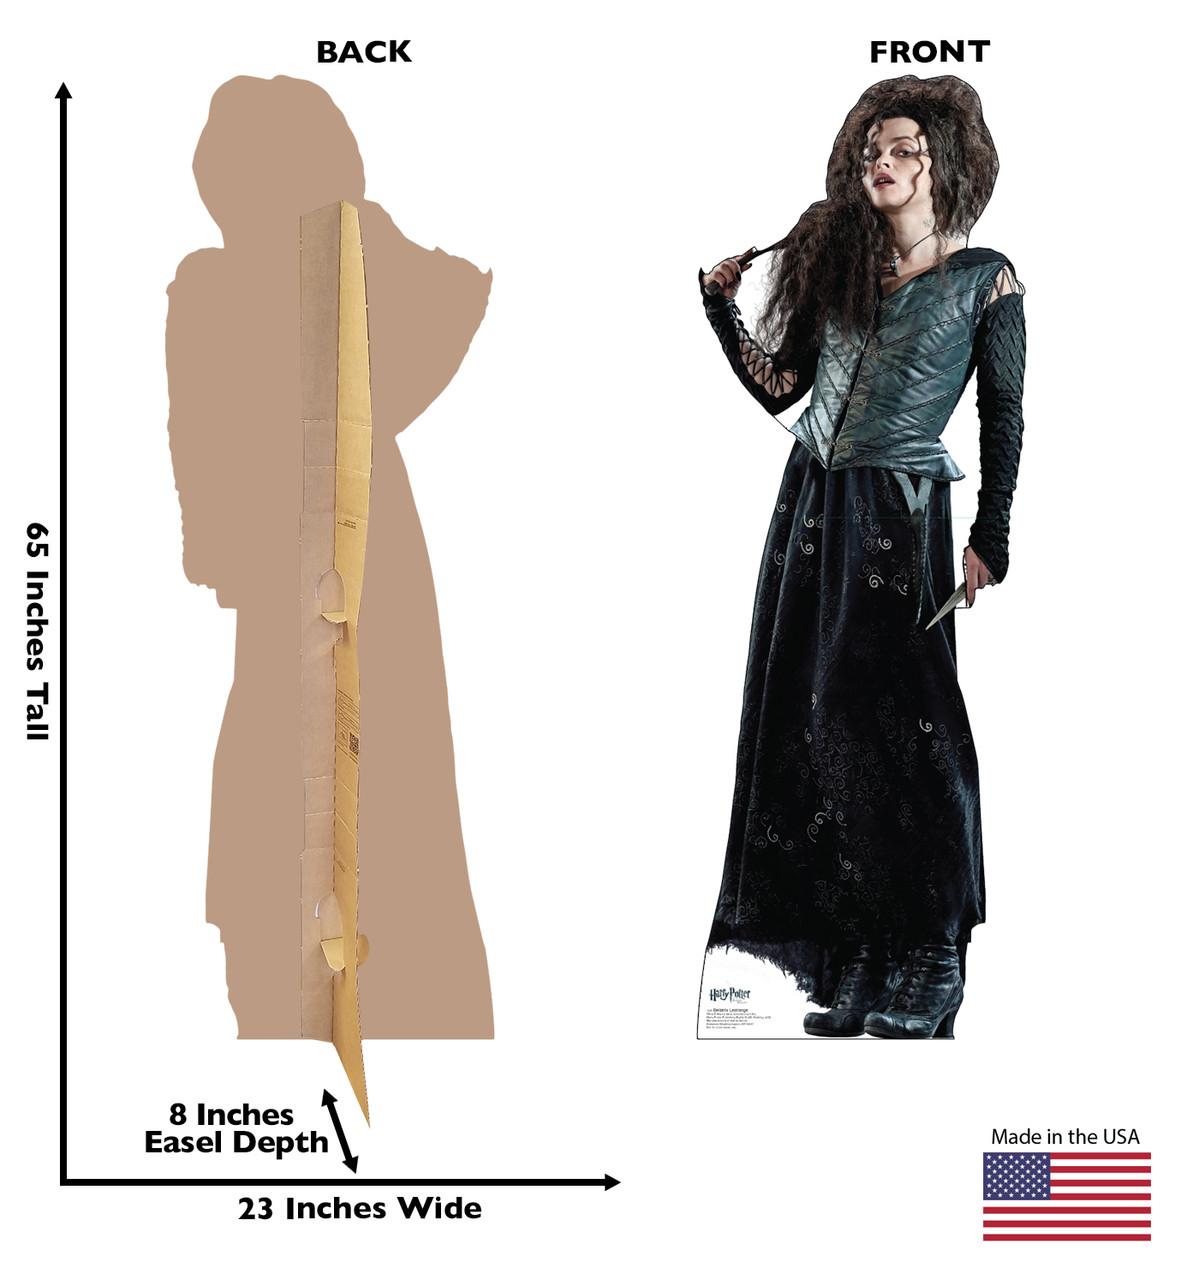 Life-size Bellatrix Lestrange Cardboard Standup | Cardboard Cutout